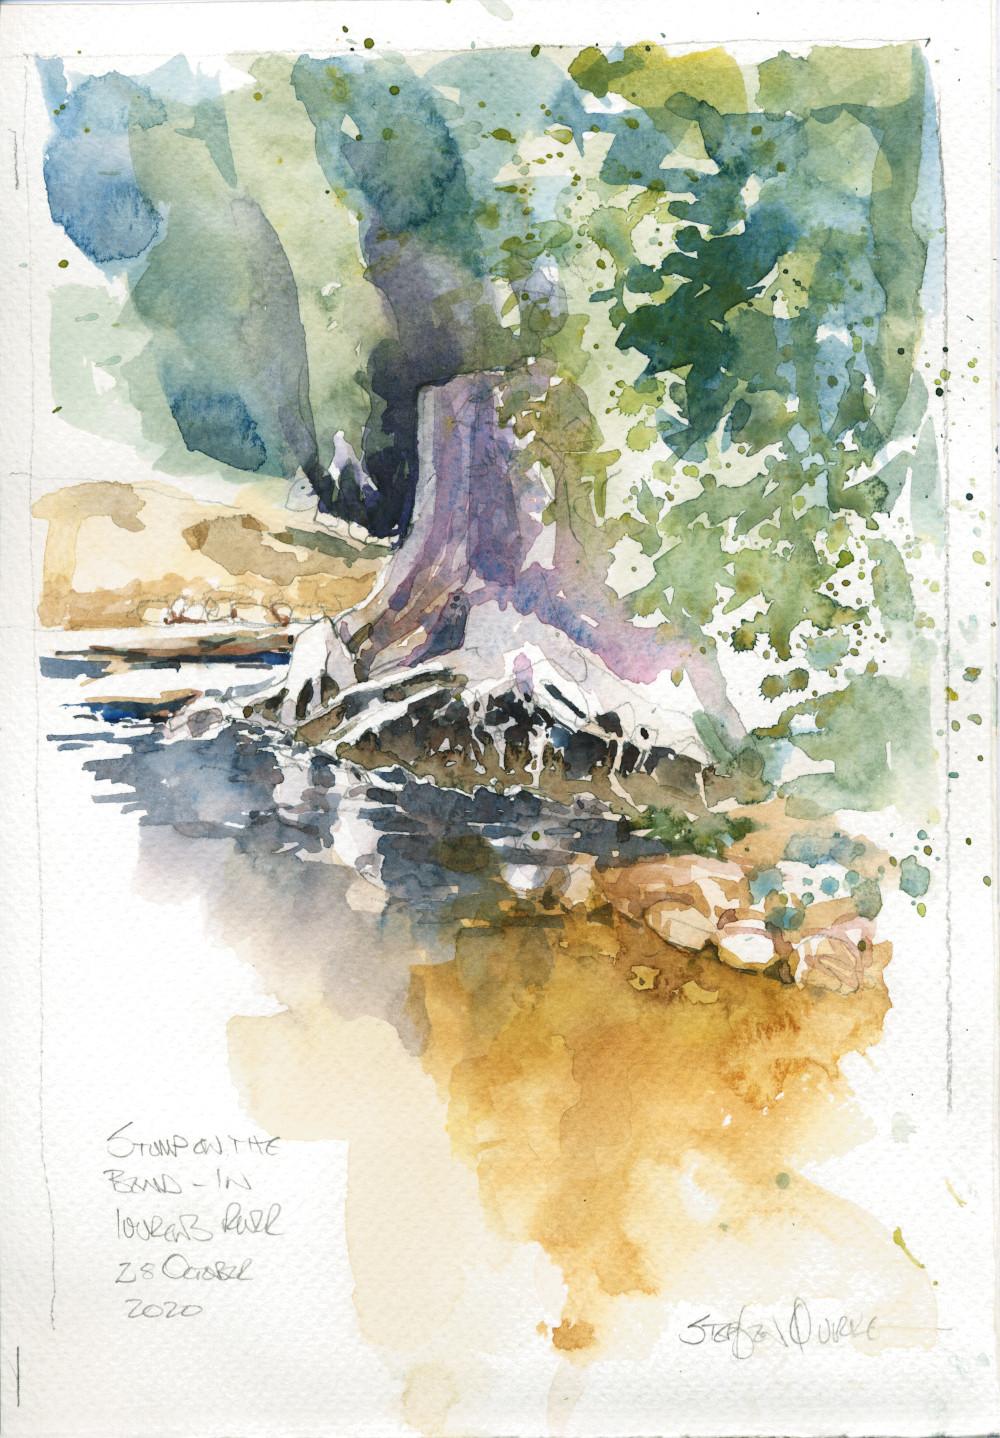 watercolour of a tree stump